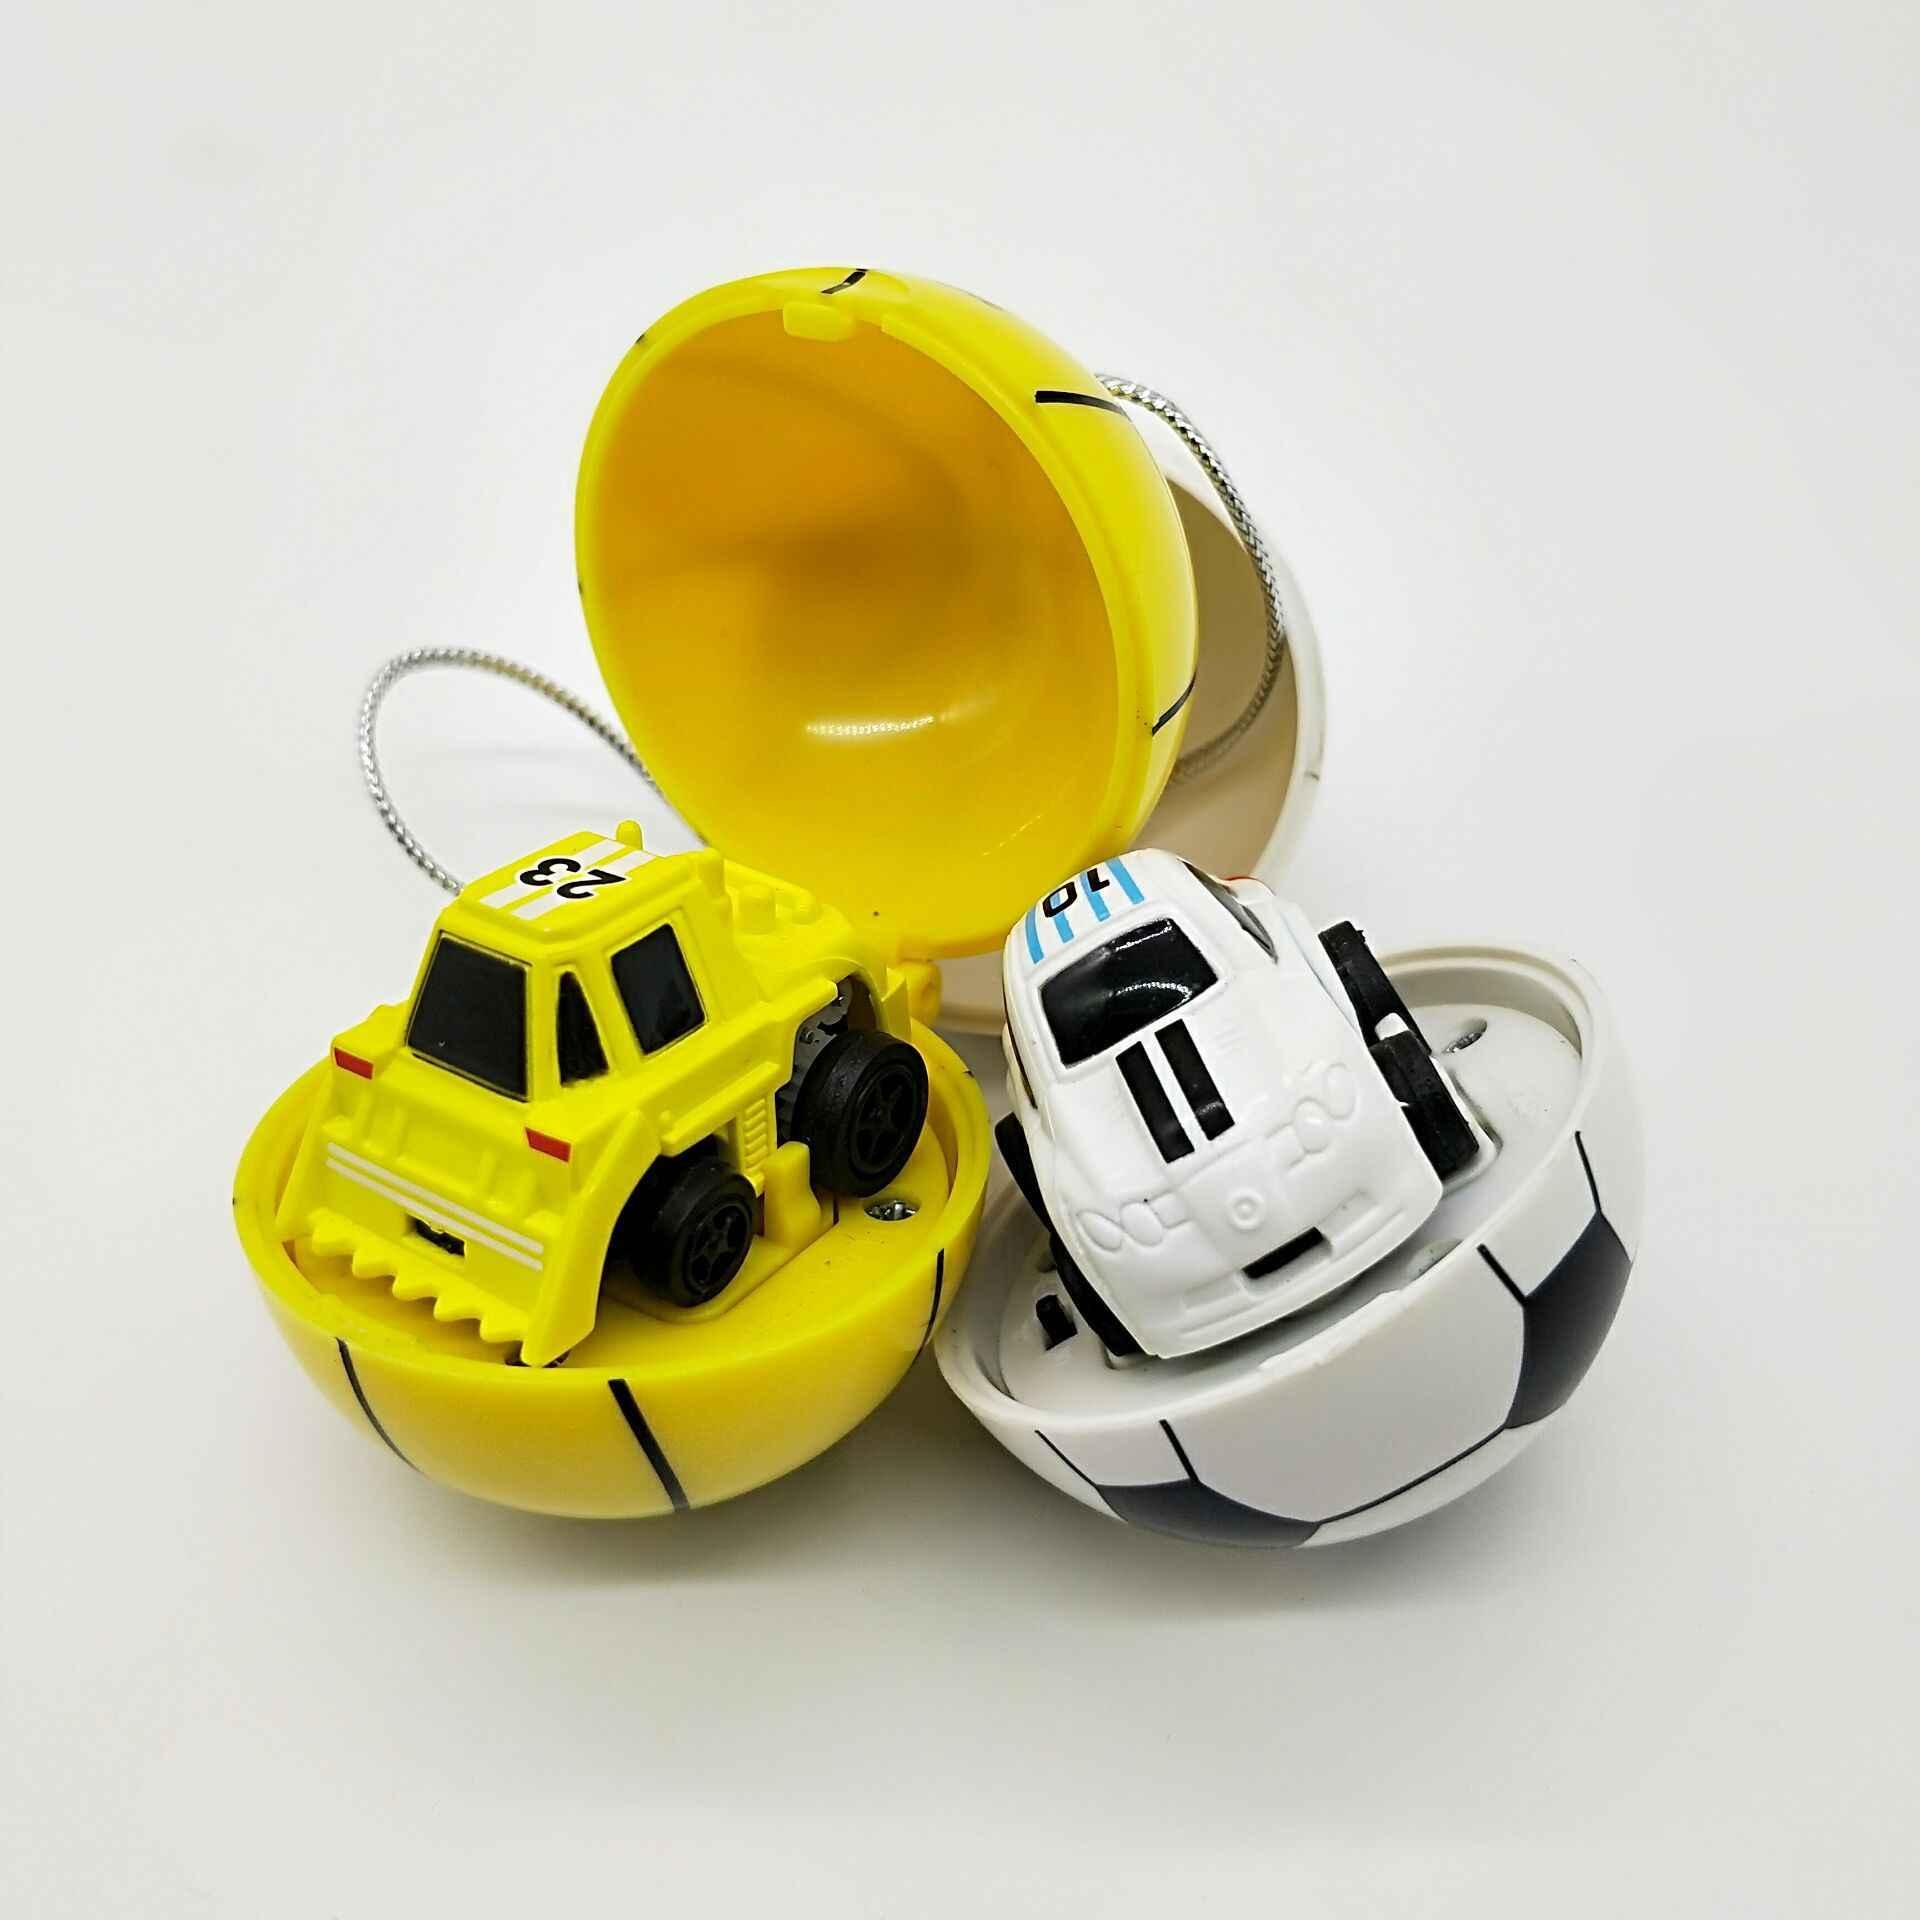 AliExpress Advantage Supply 2 4G Mini Football Two-Way Remote Control Car  Race Car Electric Model Toy